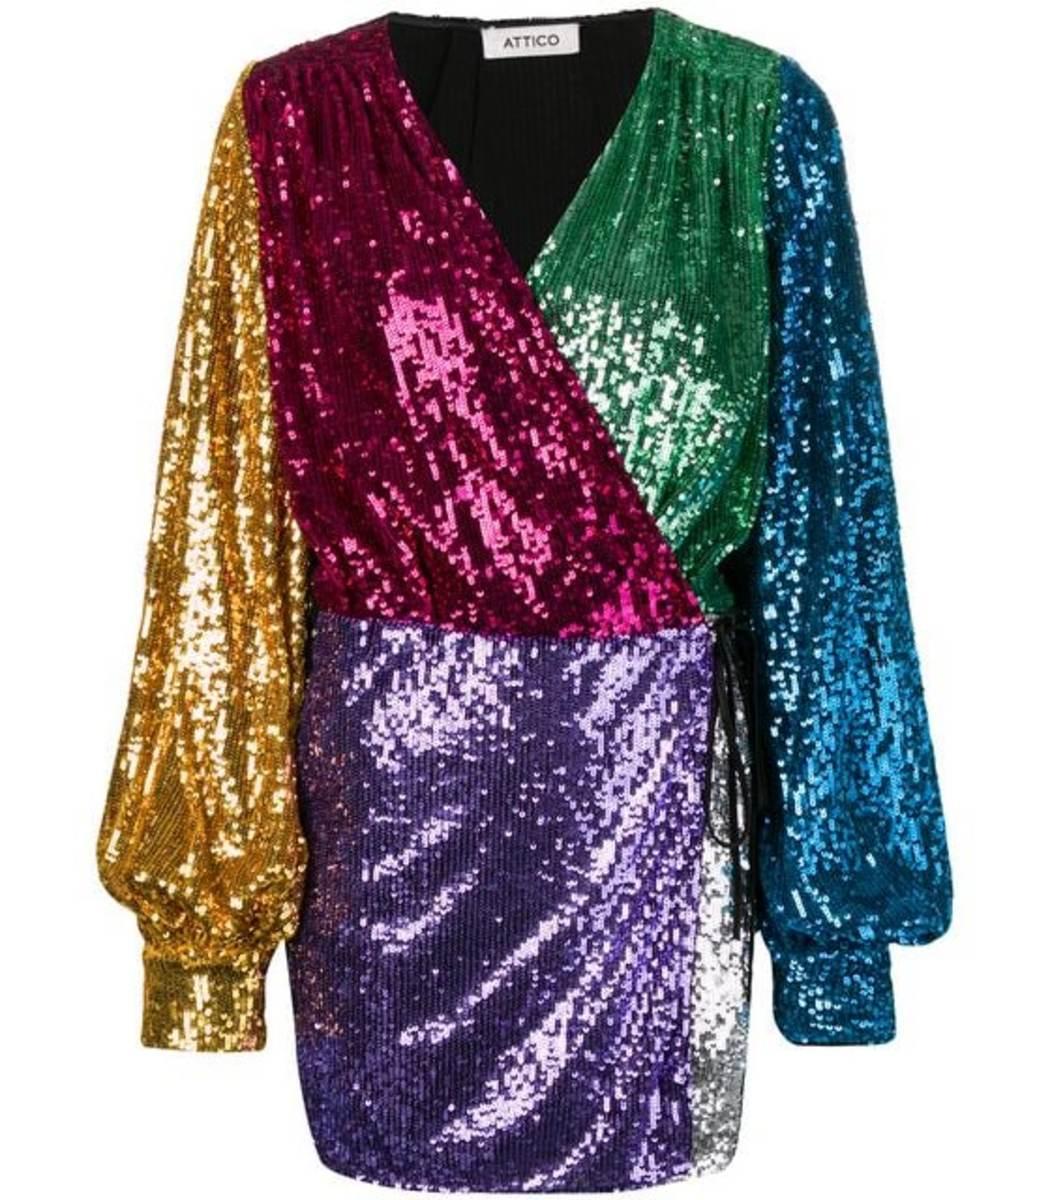 Attico Dresses Sequin Mini Wrap Dress